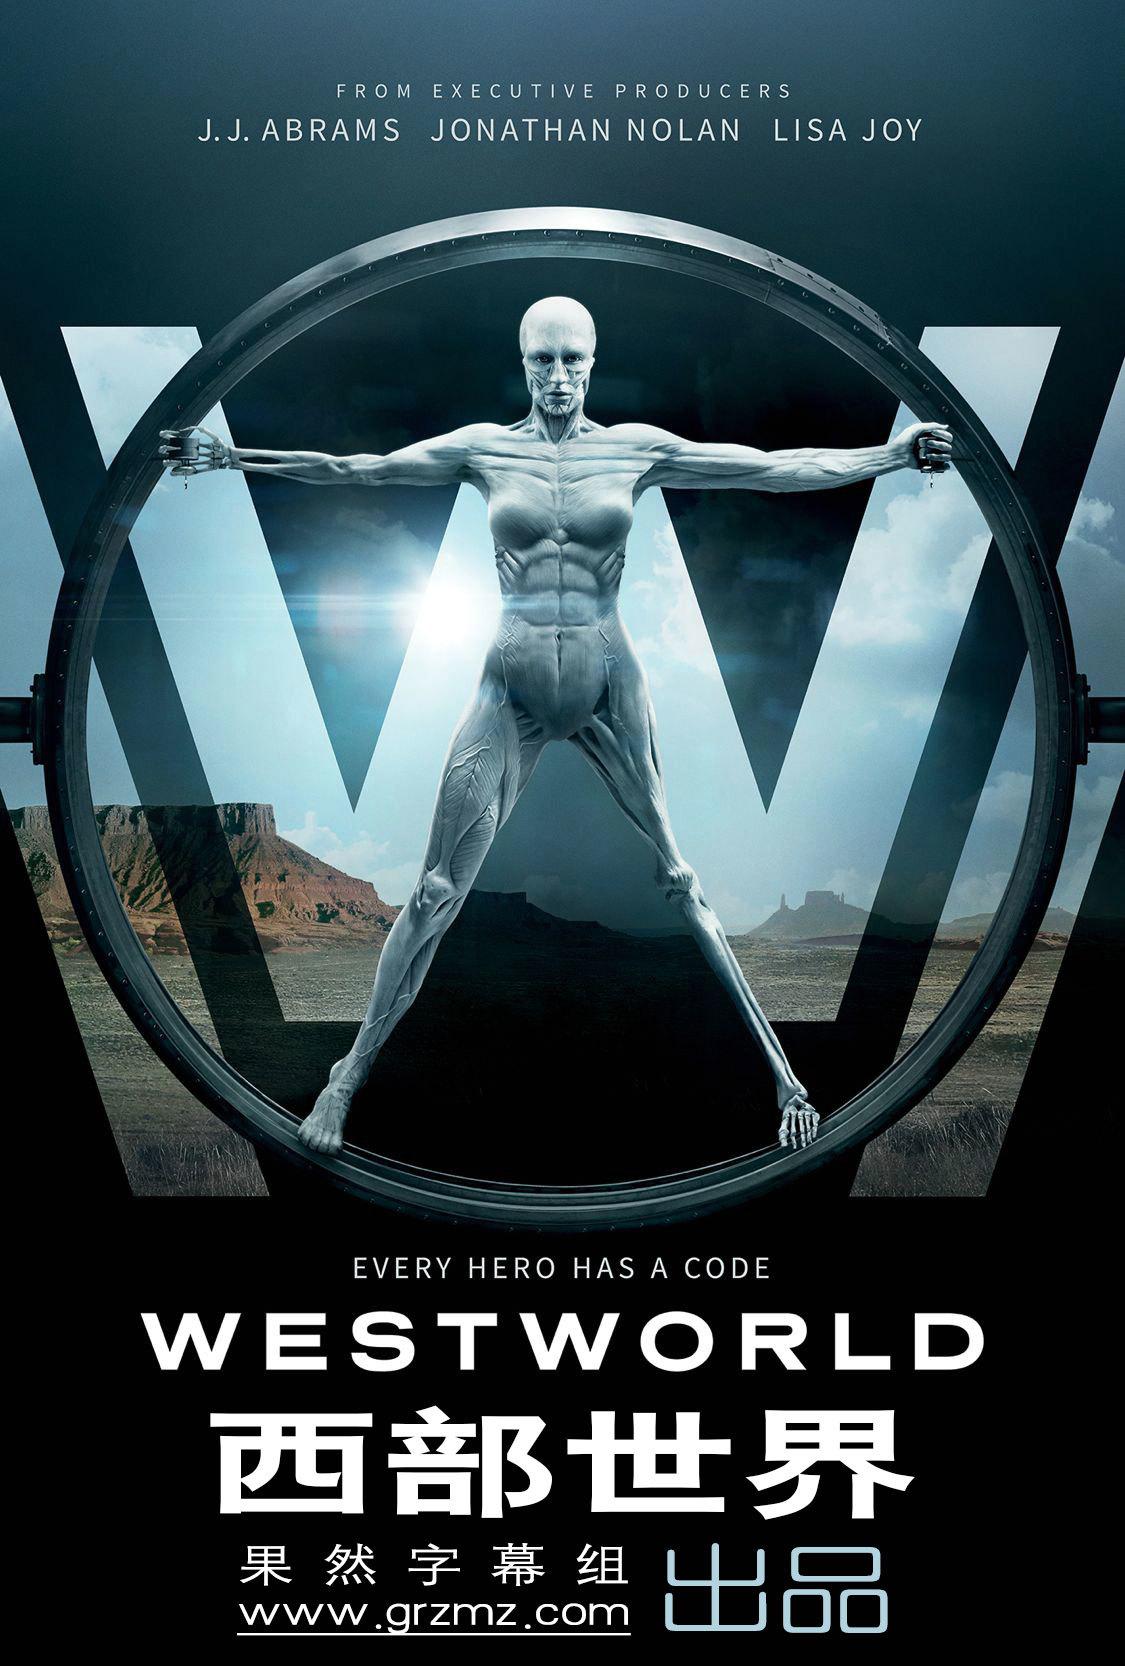 westworld-%e7%ab%96%e7%89%88